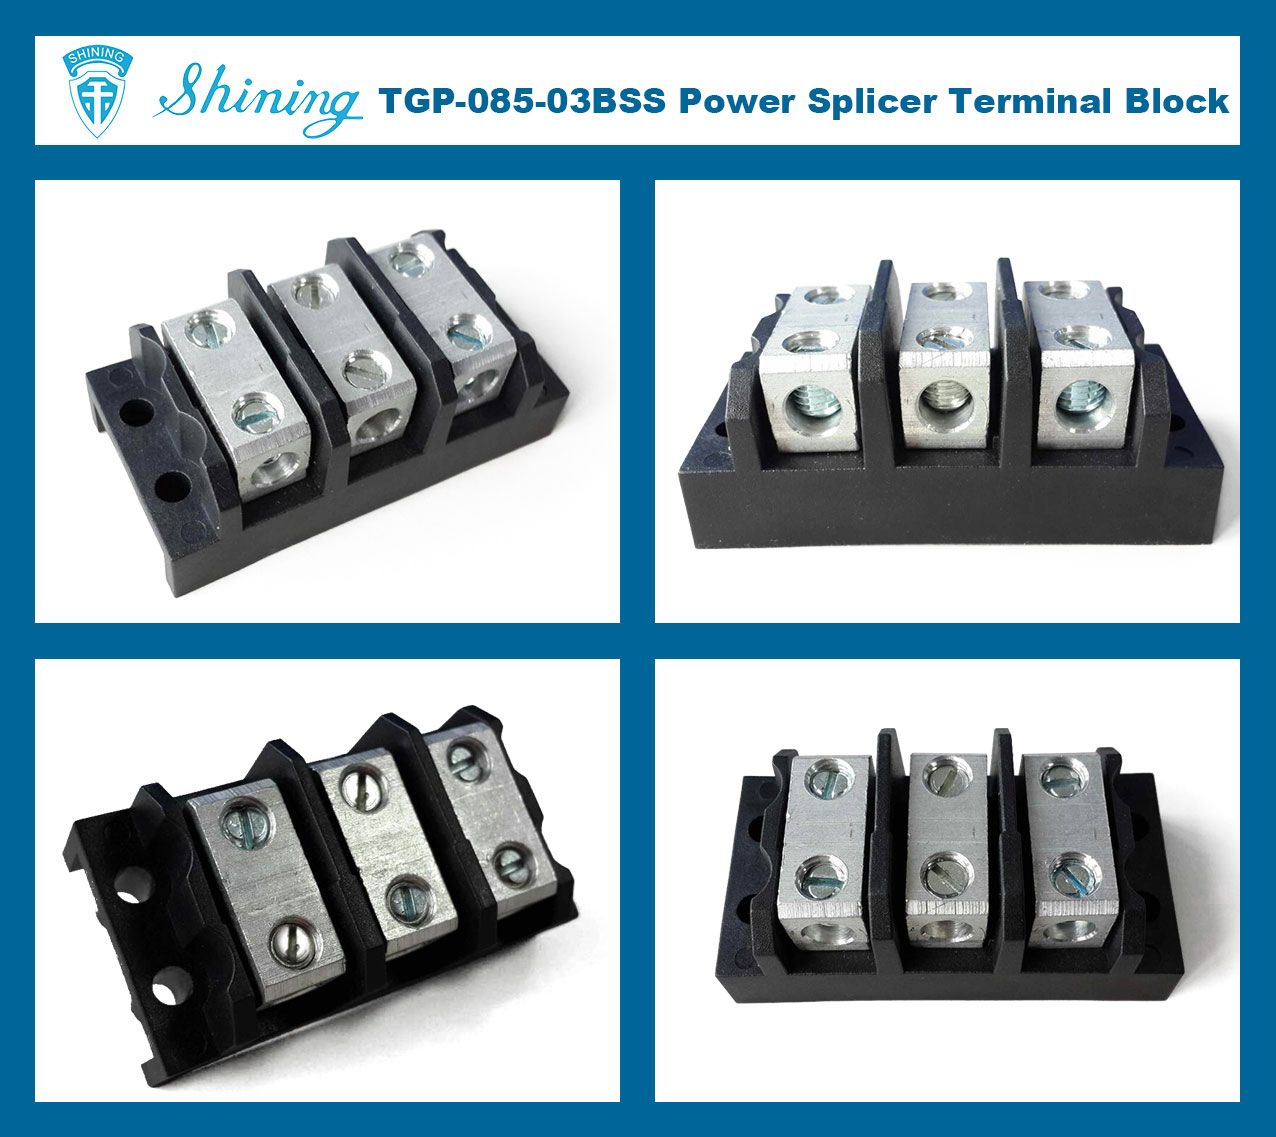 TGP-085-03BHH 600V 85A 3 Way Power Splicer Terminal Block